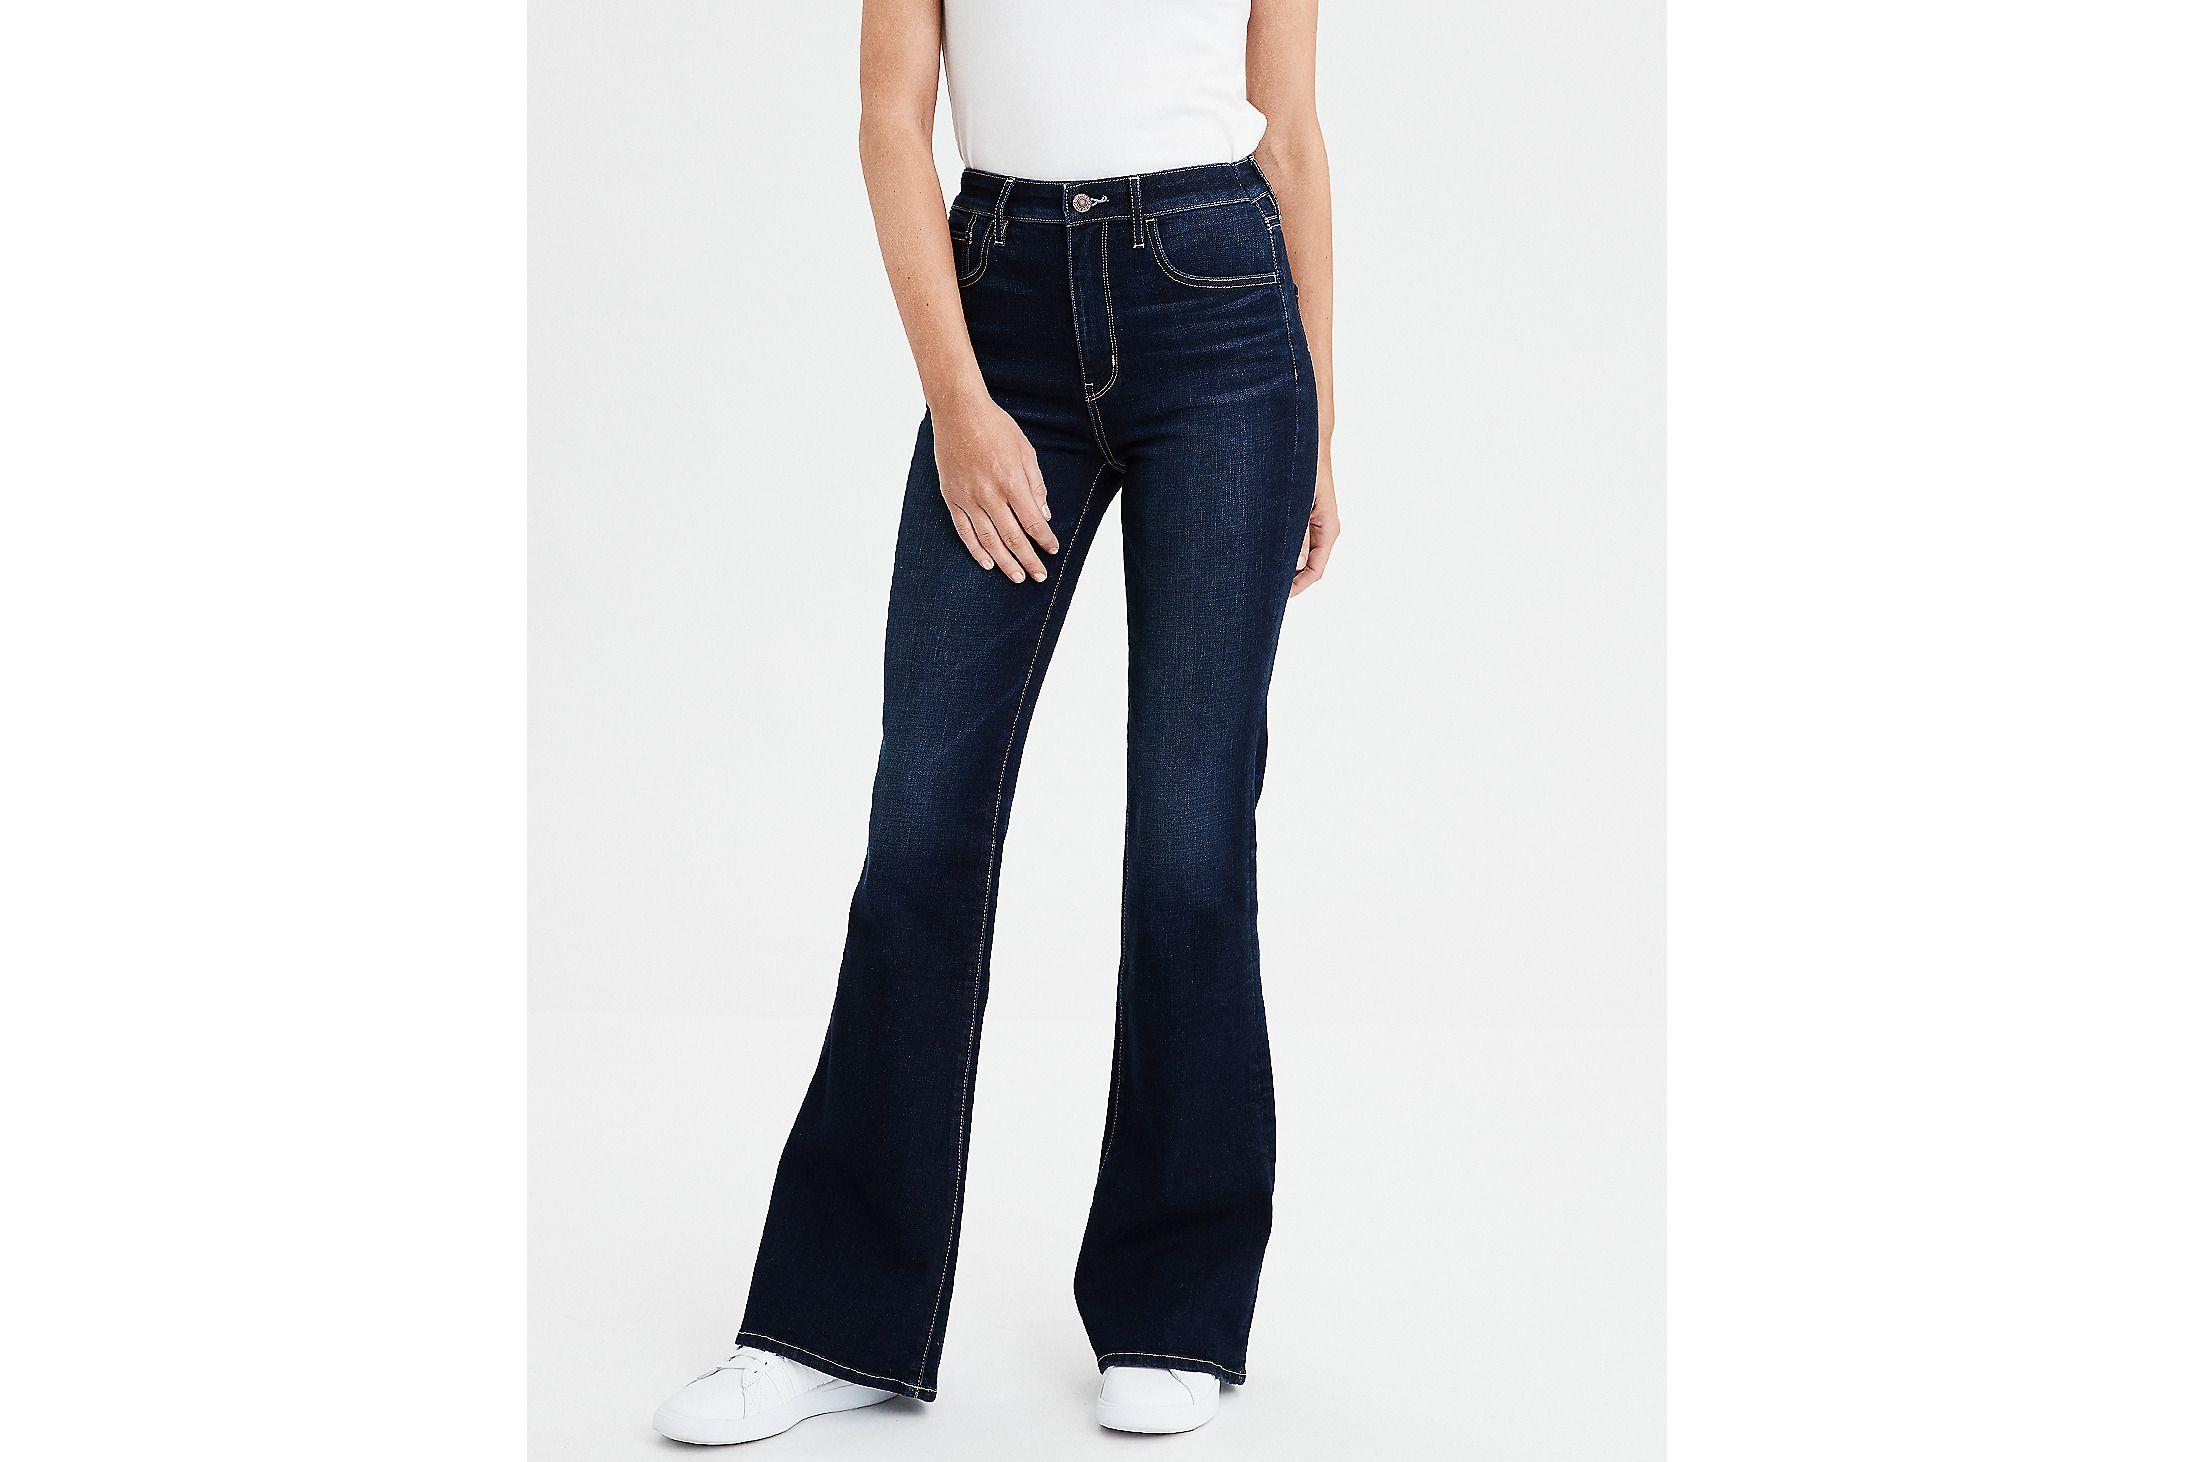 42523b99aca 12 Best High-Waisted Jeans for Women